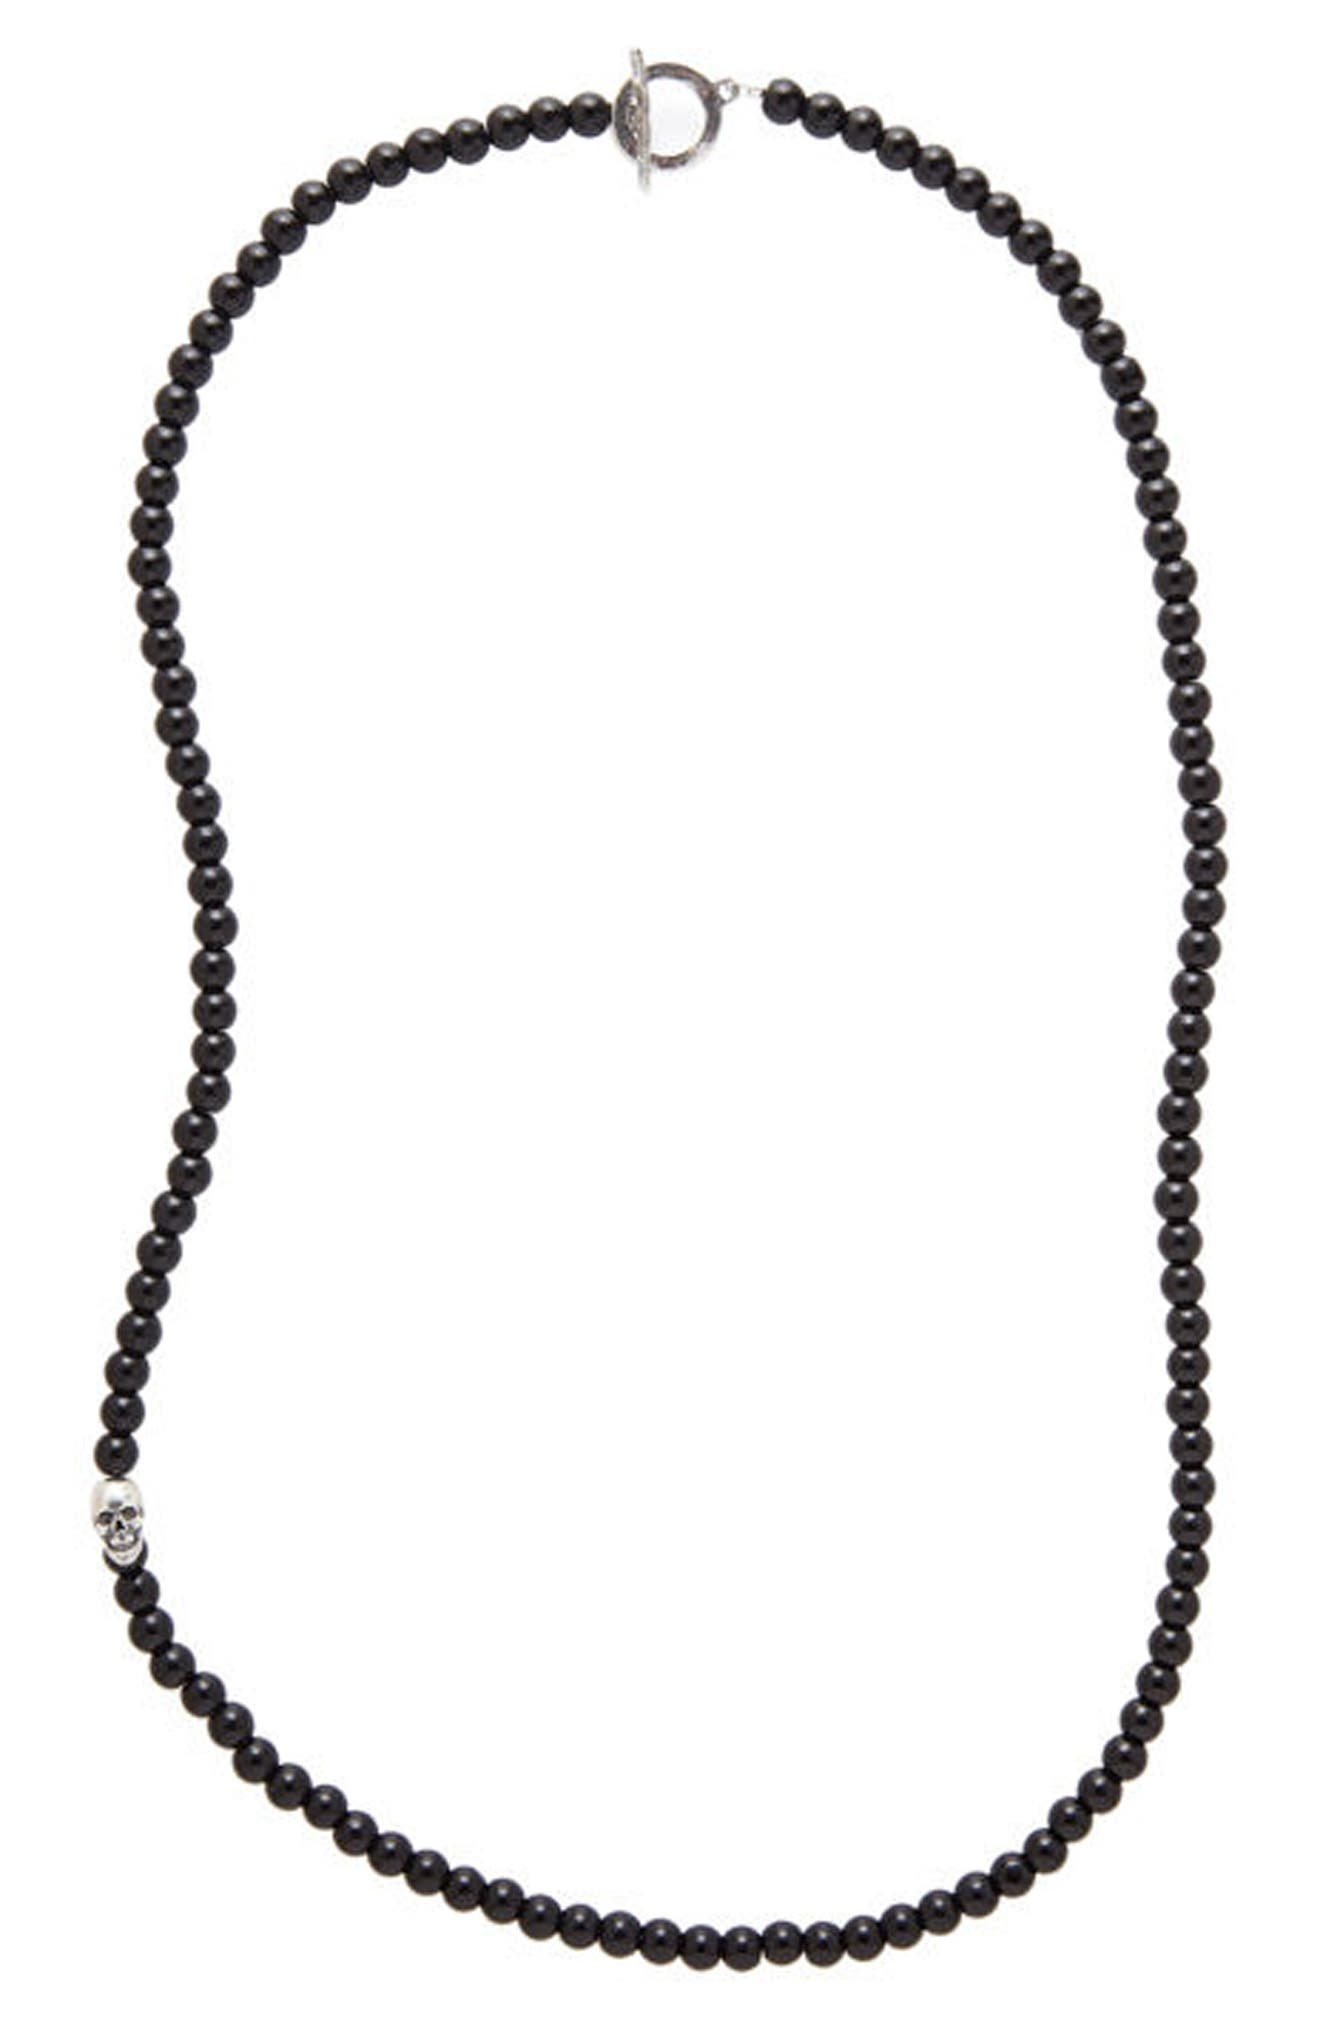 Onyx Bead Necklace,                         Main,                         color, BLACK